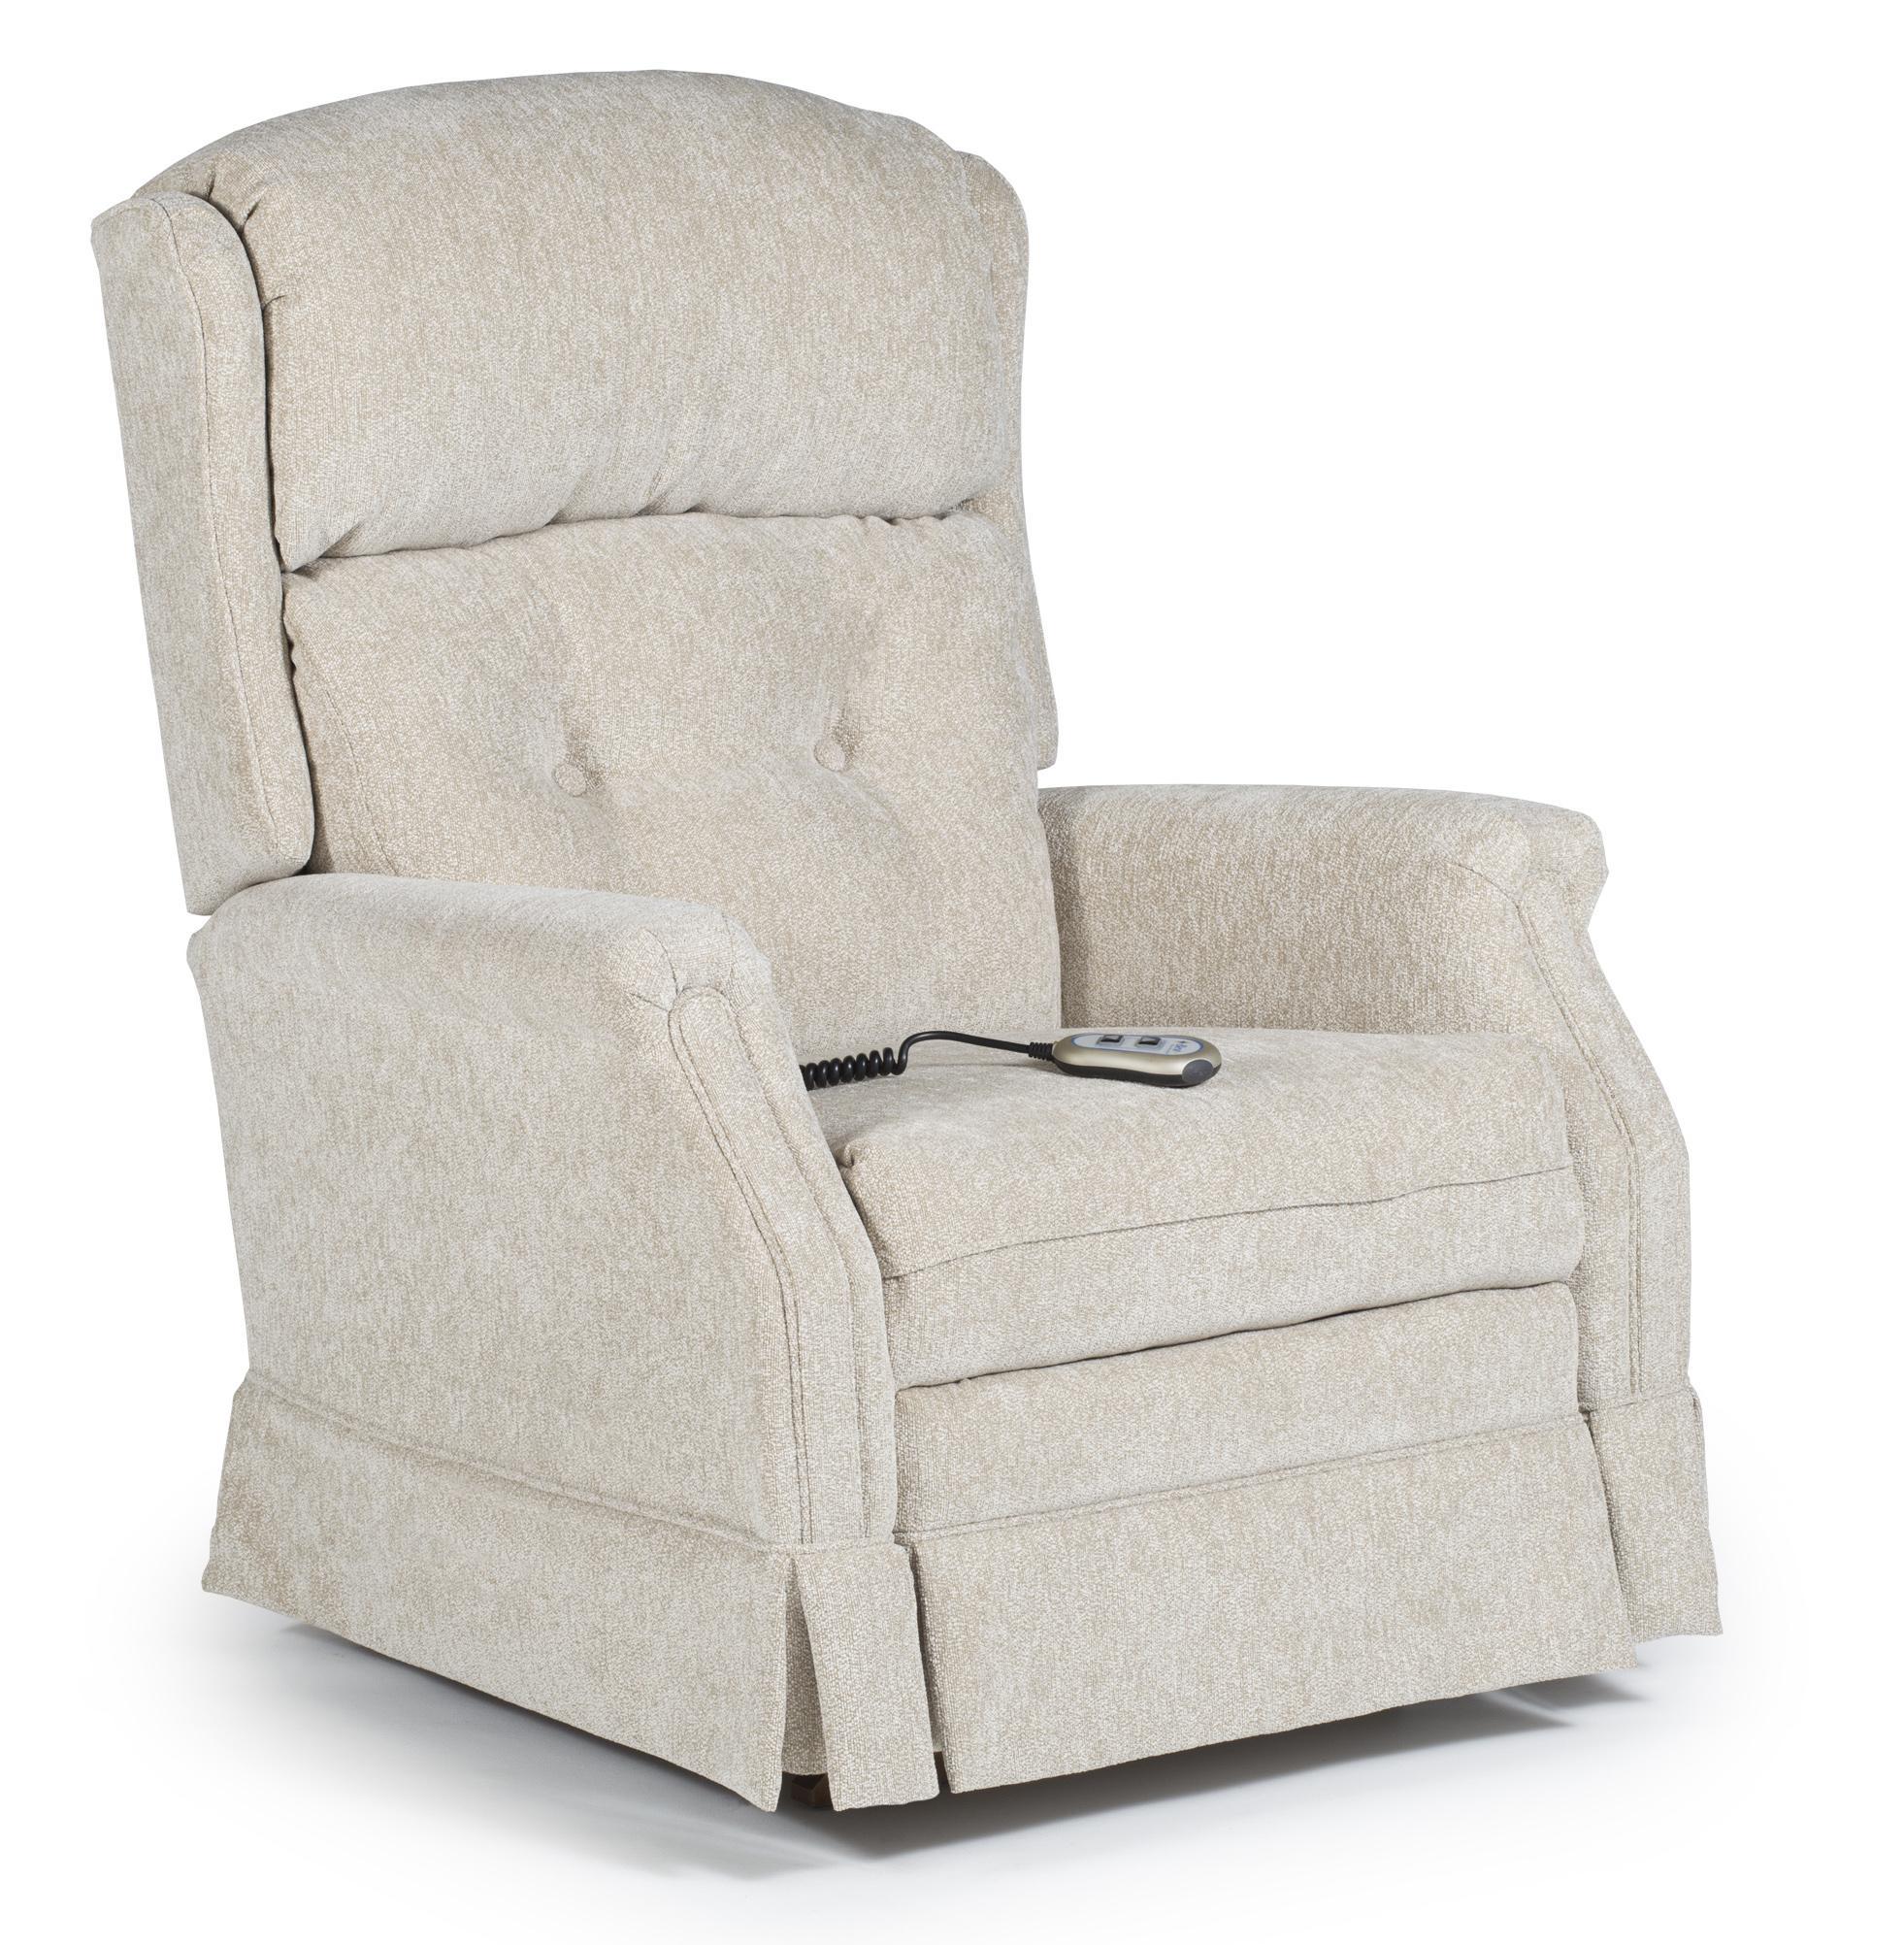 Power Rocker Recliner By Best Home Furnishings Wolf Furniture